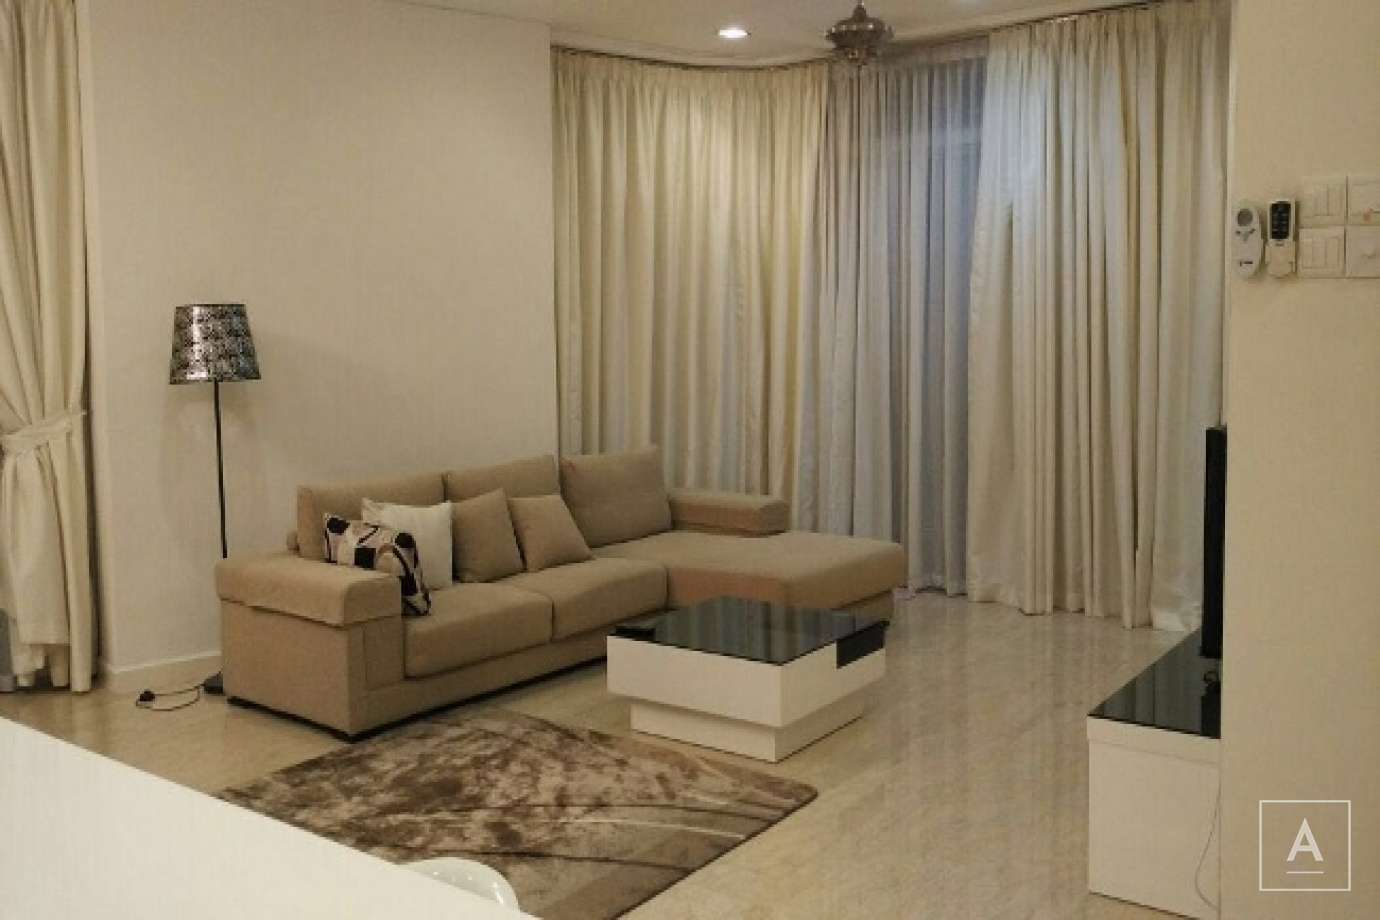 Idaman Residence, KLCC,Kuala Lumpur, 3 Bedrooms Bedrooms, ,3 BathroomsBathrooms,Condominium / Serviced Residence,To Let,Idaman Residence,Jalan Law Yew Swee,1314